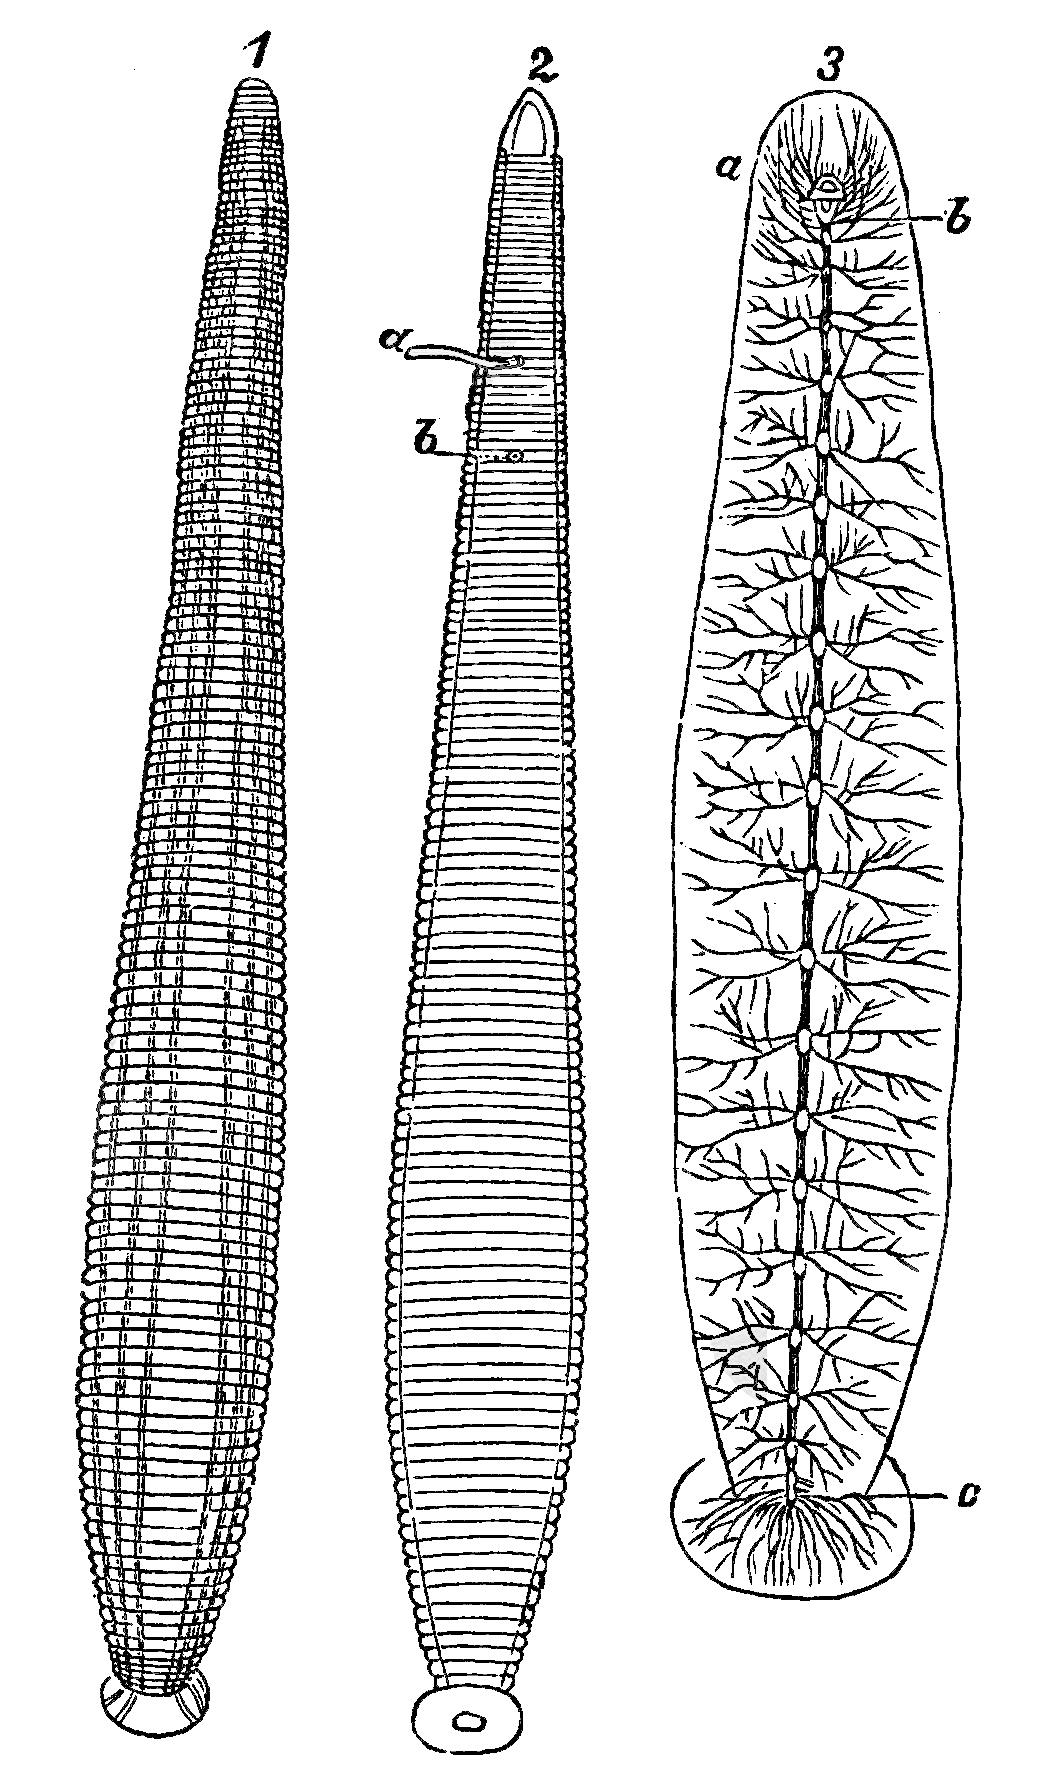 File:PSM V17 D495 The medicinal leech.jpg - Wikimedia Commons